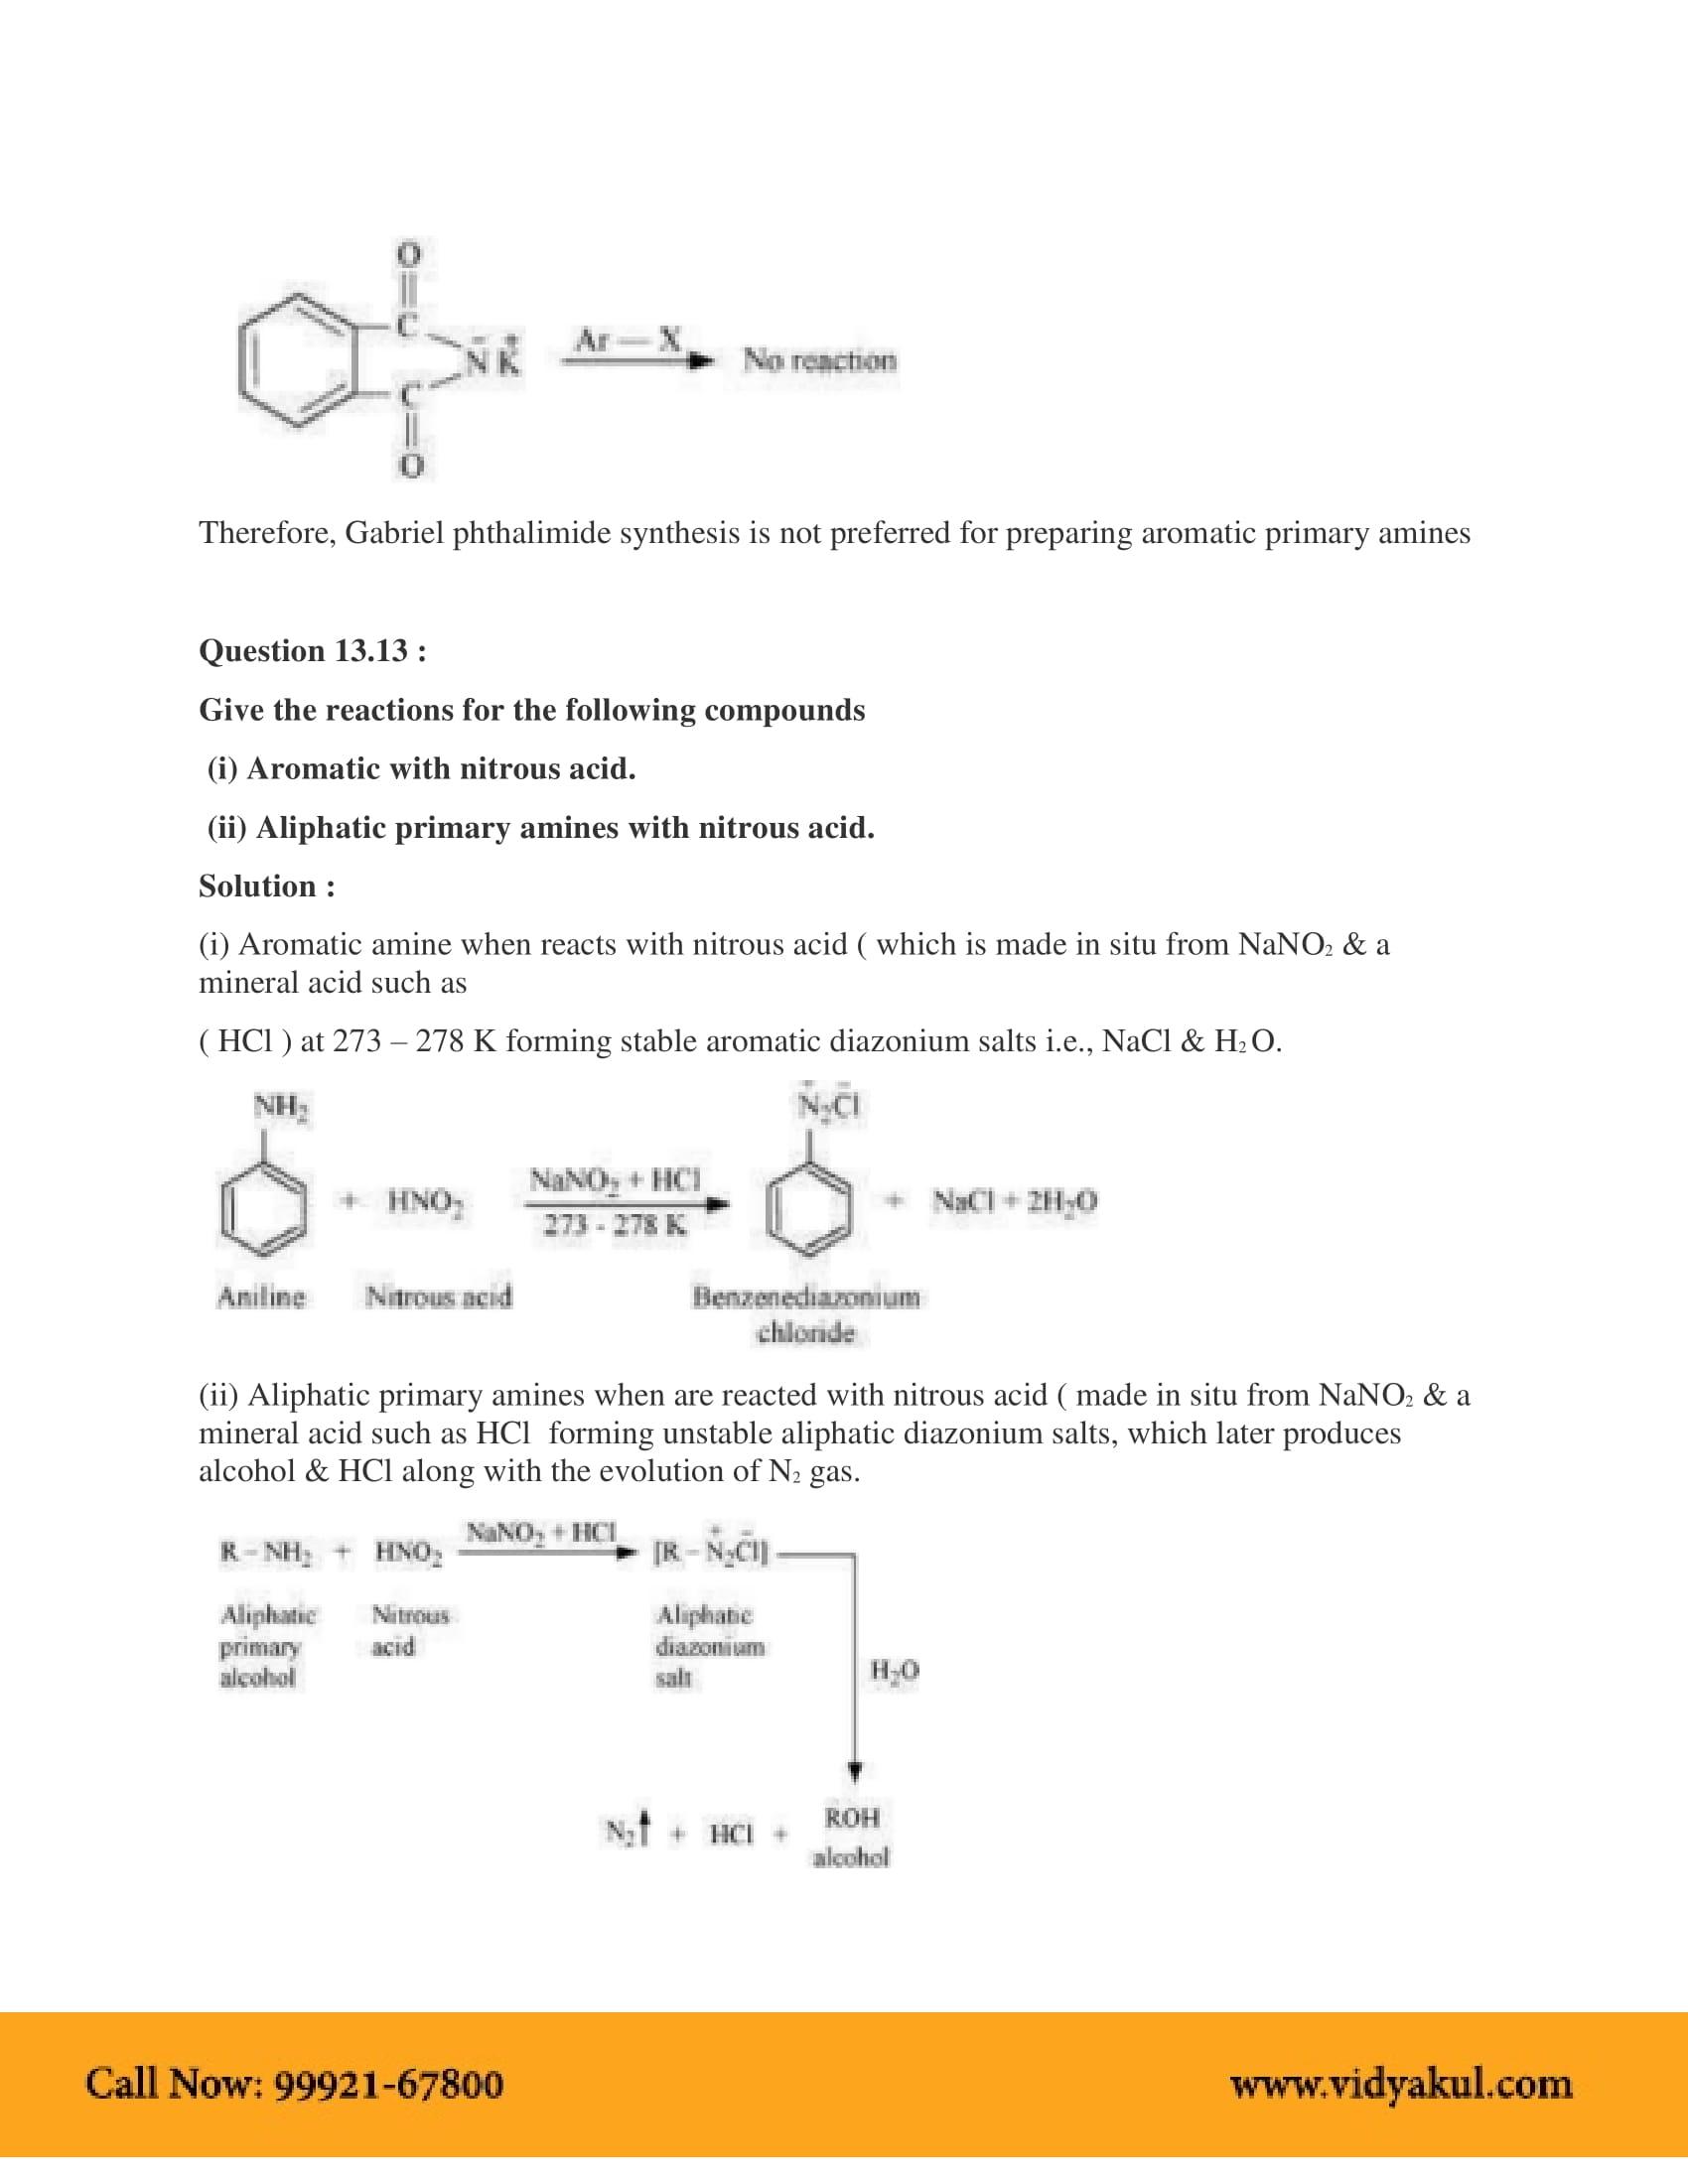 NCERT Solution Class 12 Chemistry Chapter 13 | Vidyakul